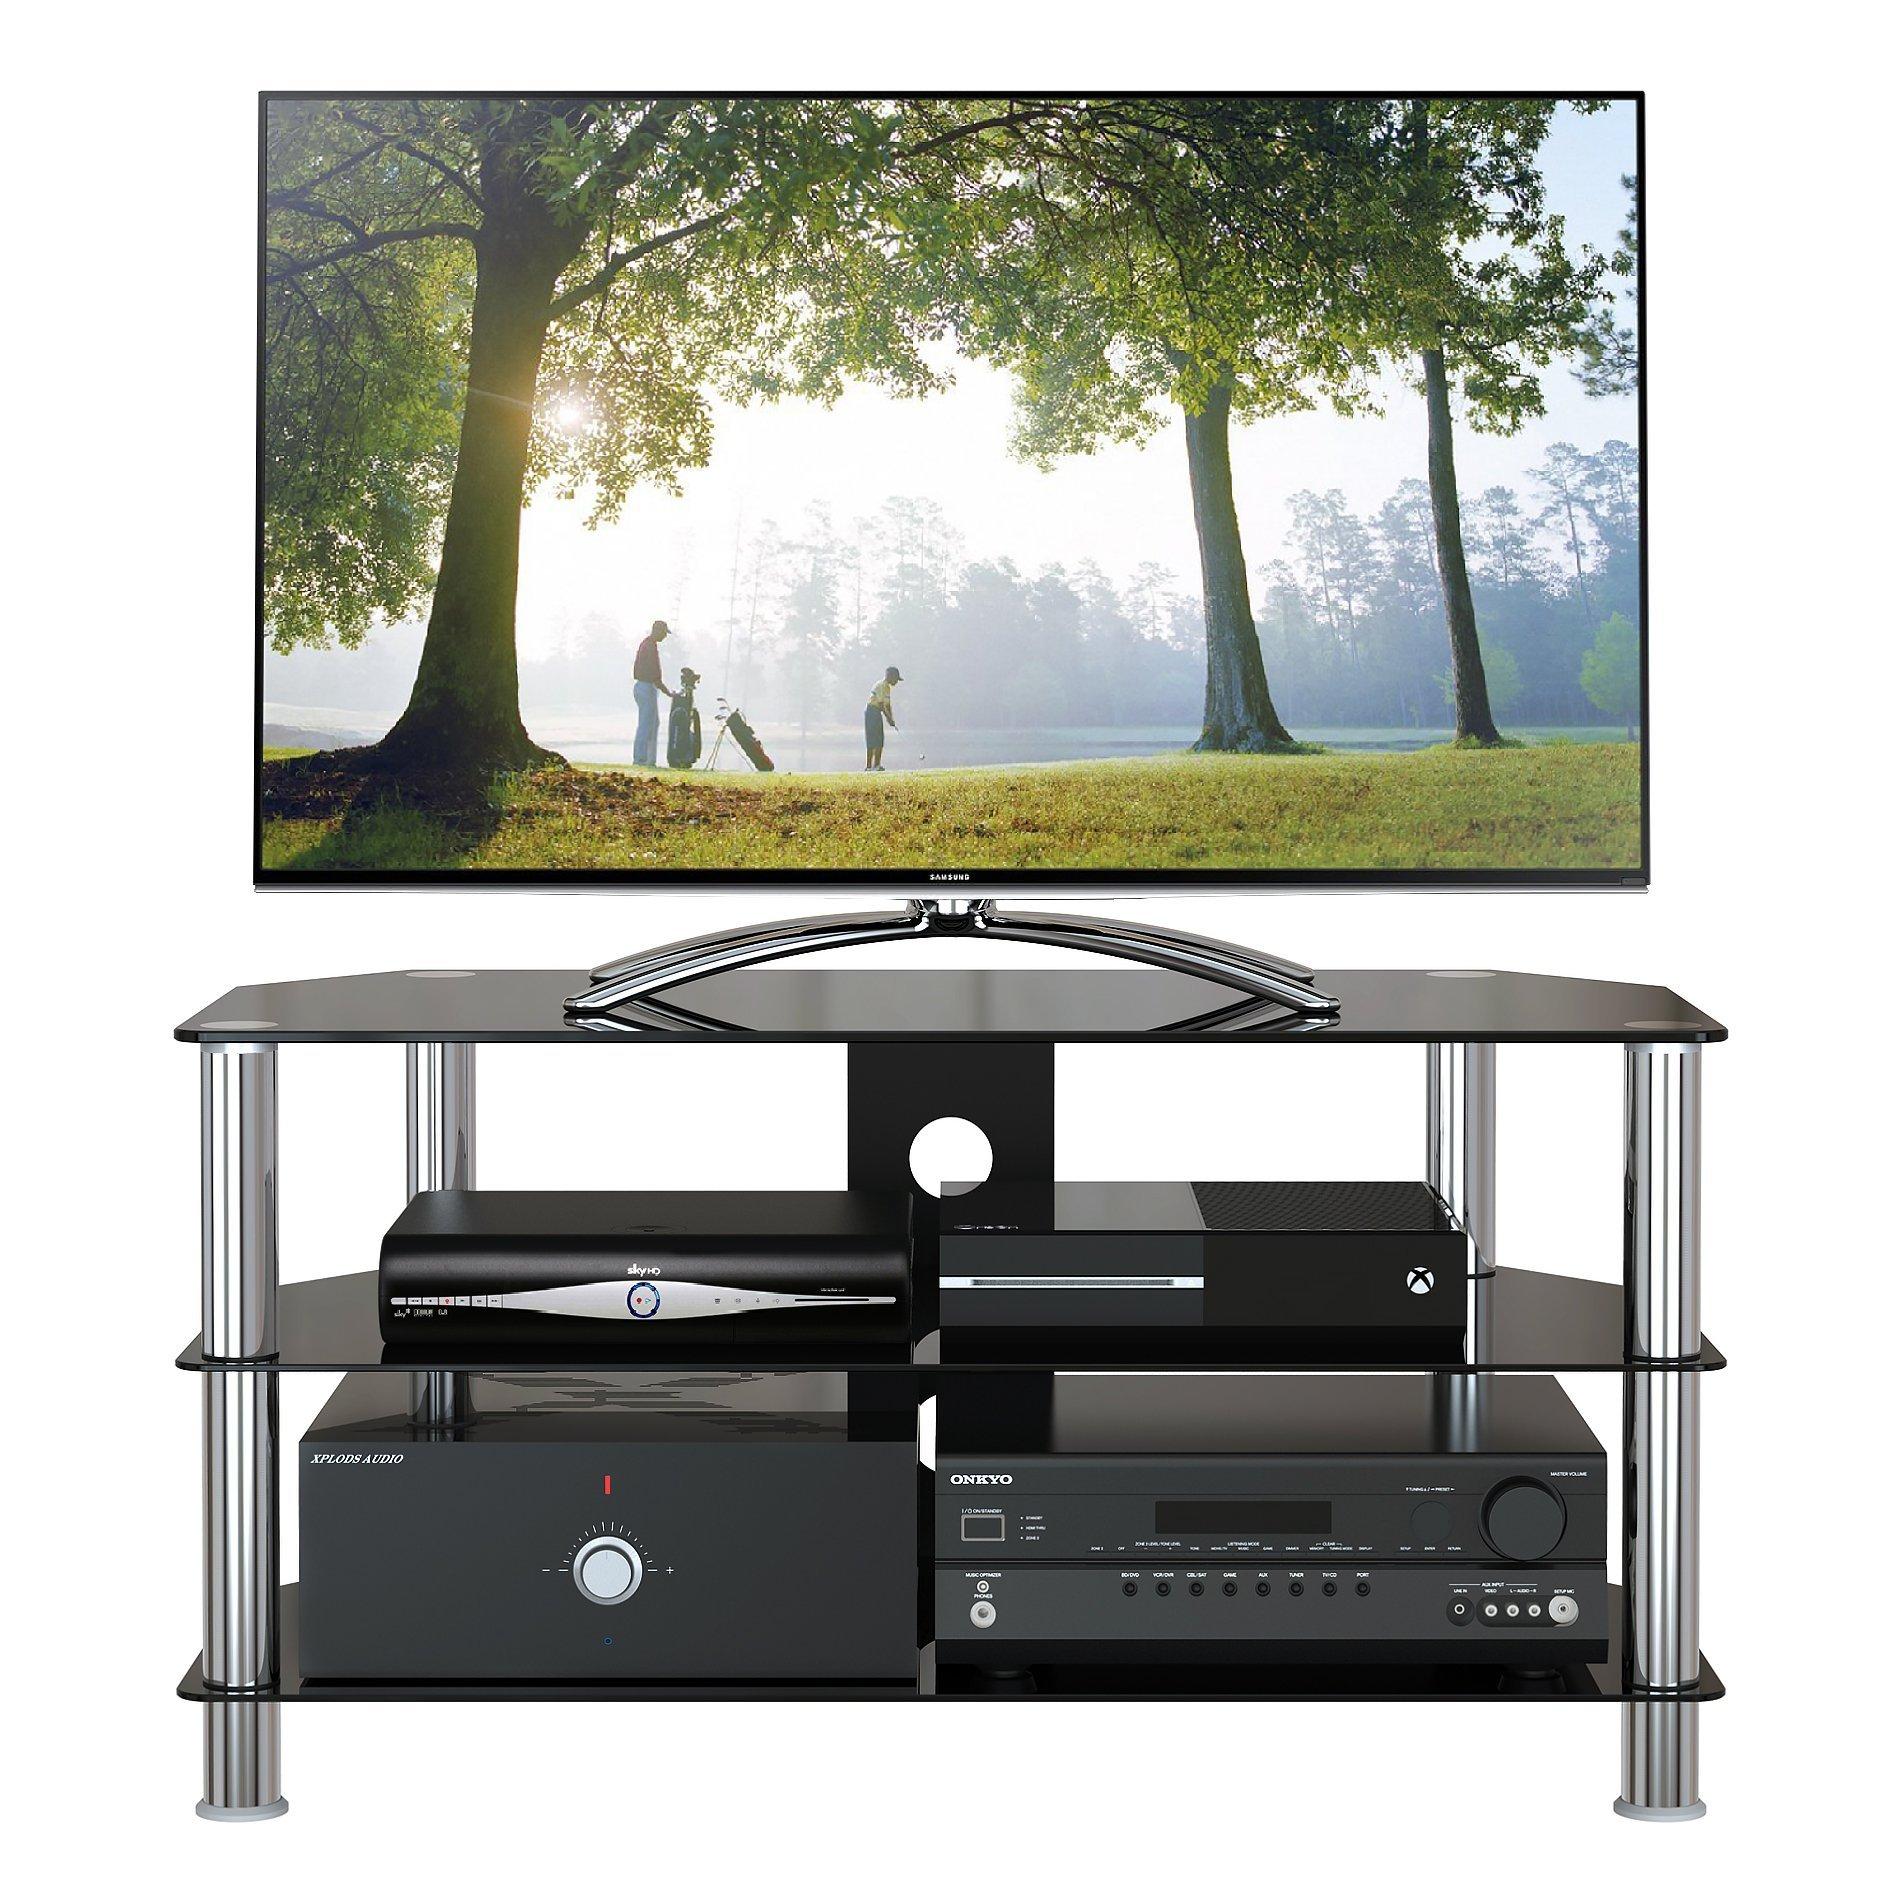 091d0543c 1home Soporte Vidrio Templado Negro de TV para 32-60pulgadas 100 cm de  Ancho de